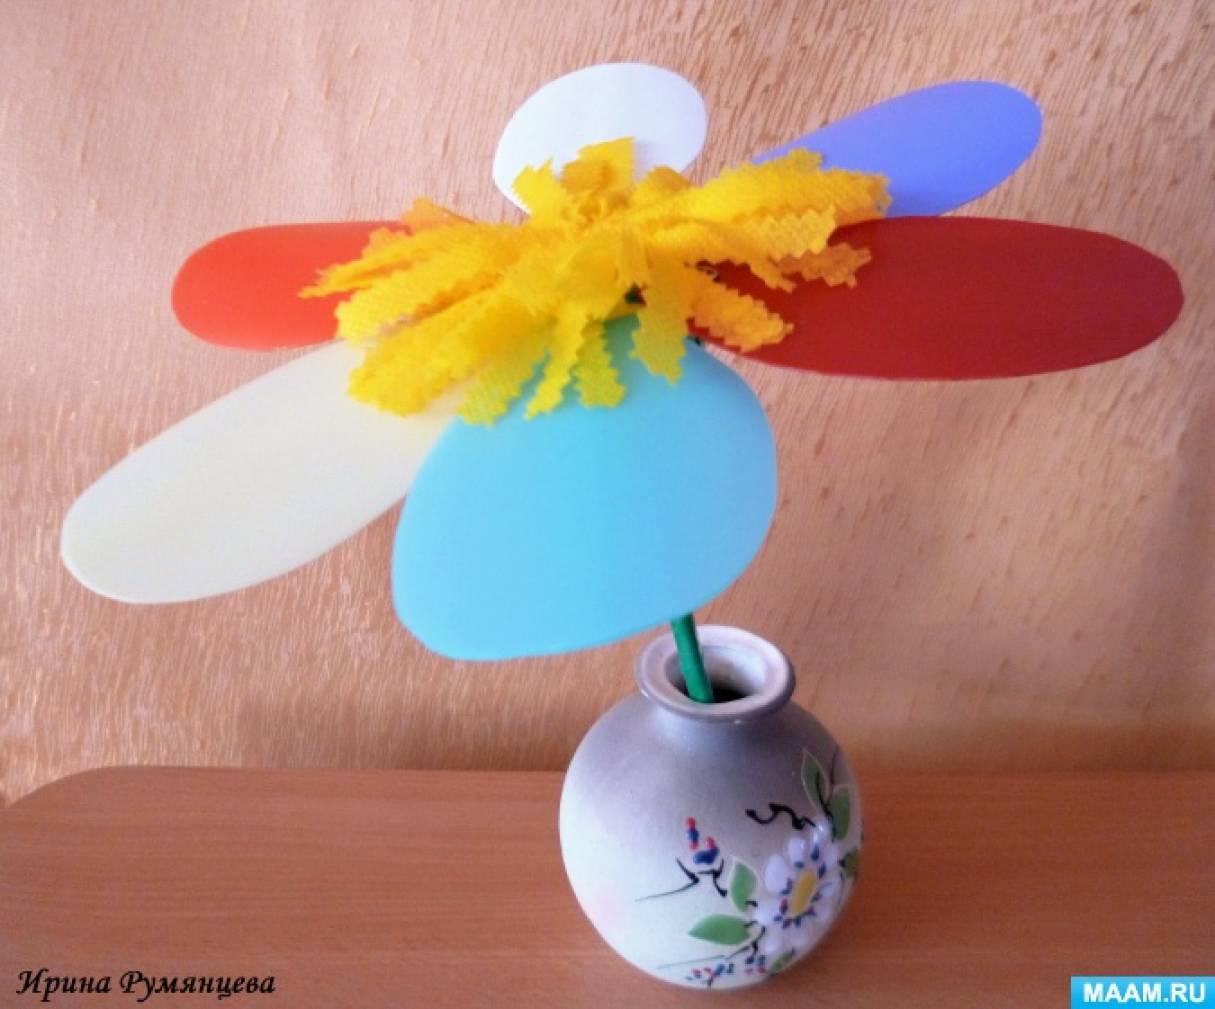 Мастер-класс изготовления атрибута «Цветок со съемными лепестками»